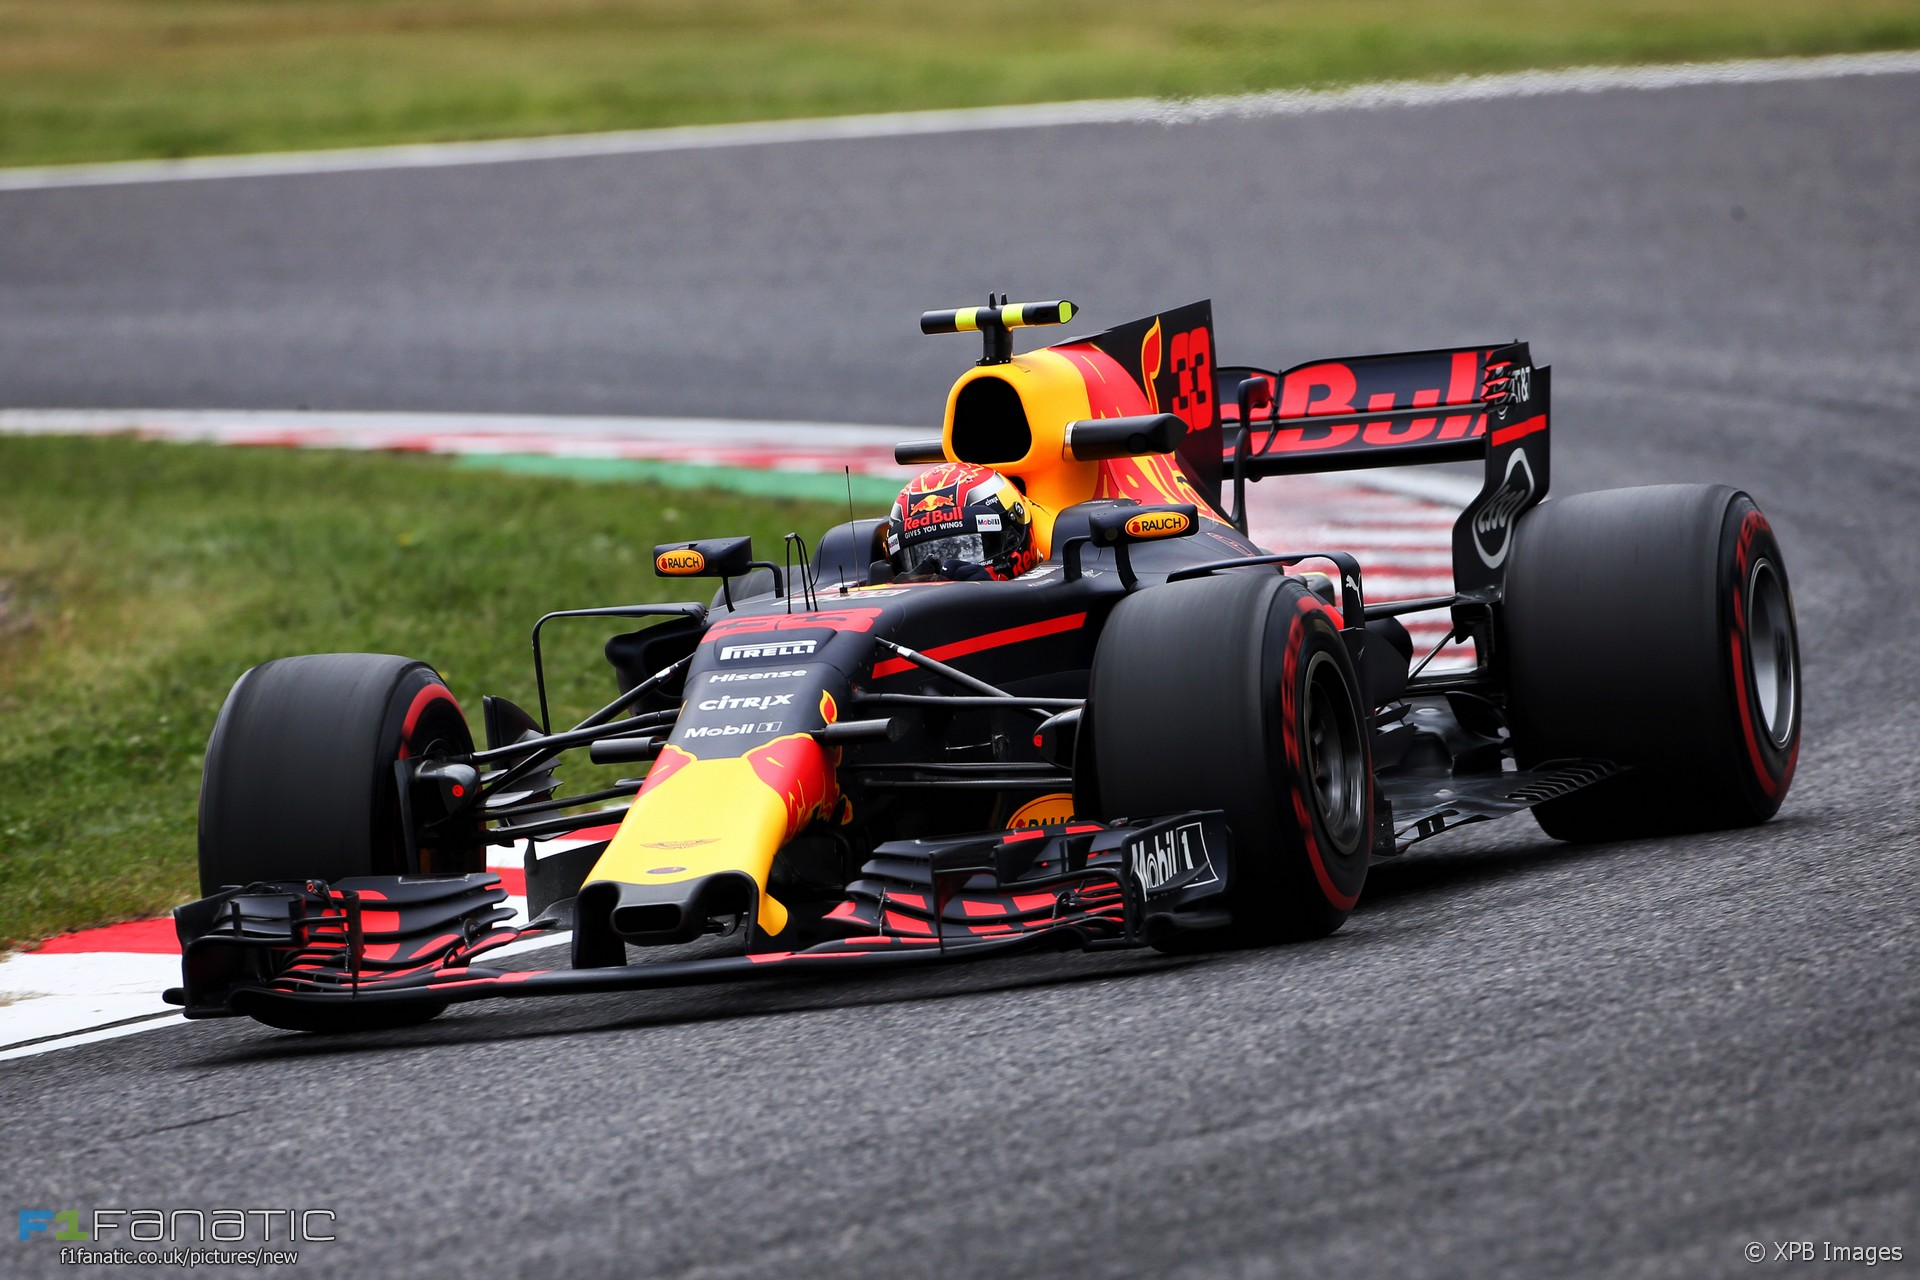 Max Verstappen  Red Bull  Suzuka  2017  U00b7 Racefans